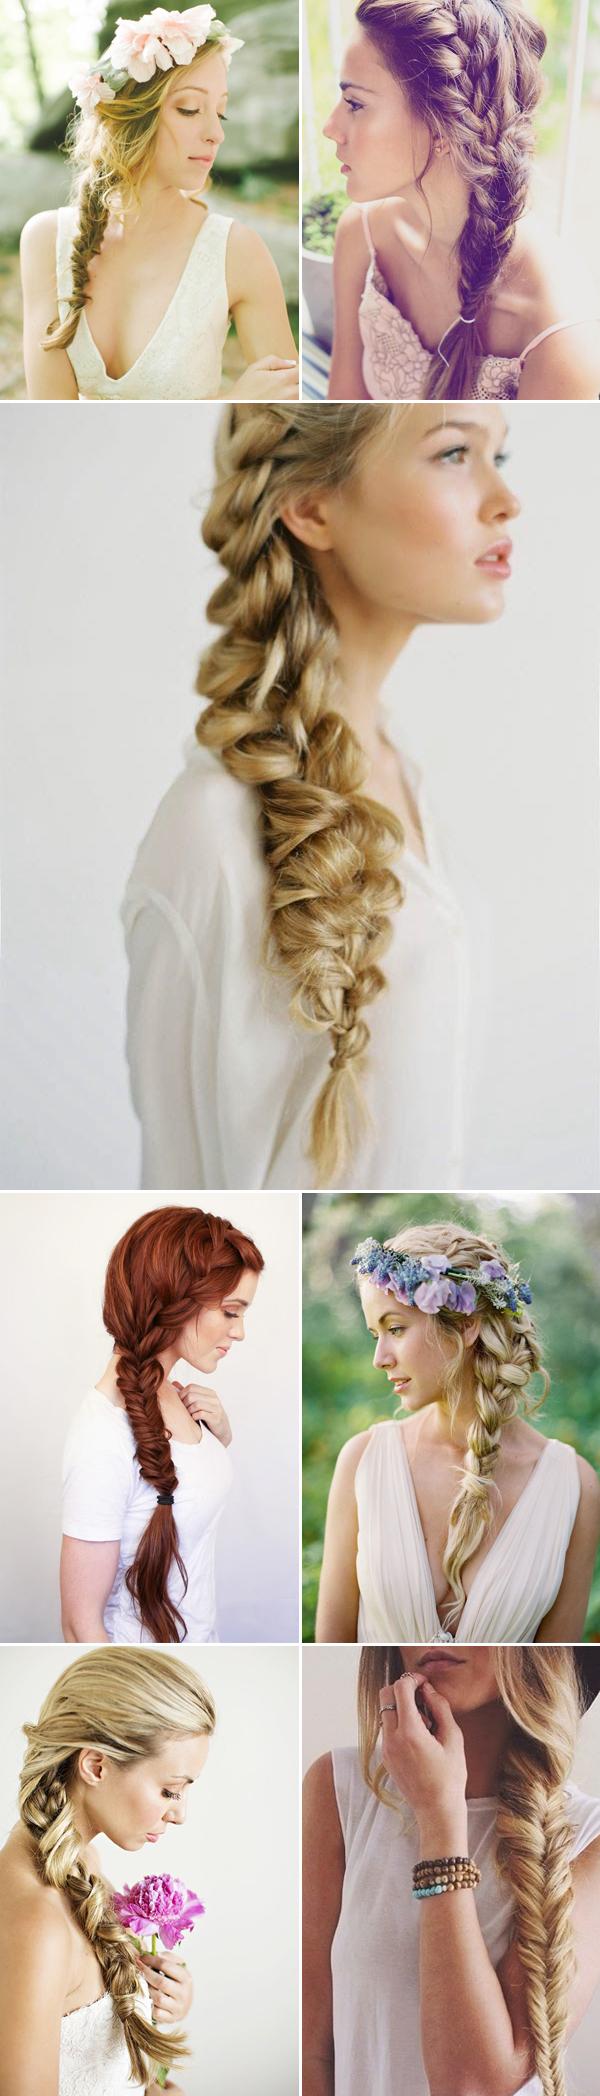 Super Oh So Romantic 20 Natural Bohemian Braided Hairstyles Praise Short Hairstyles Gunalazisus